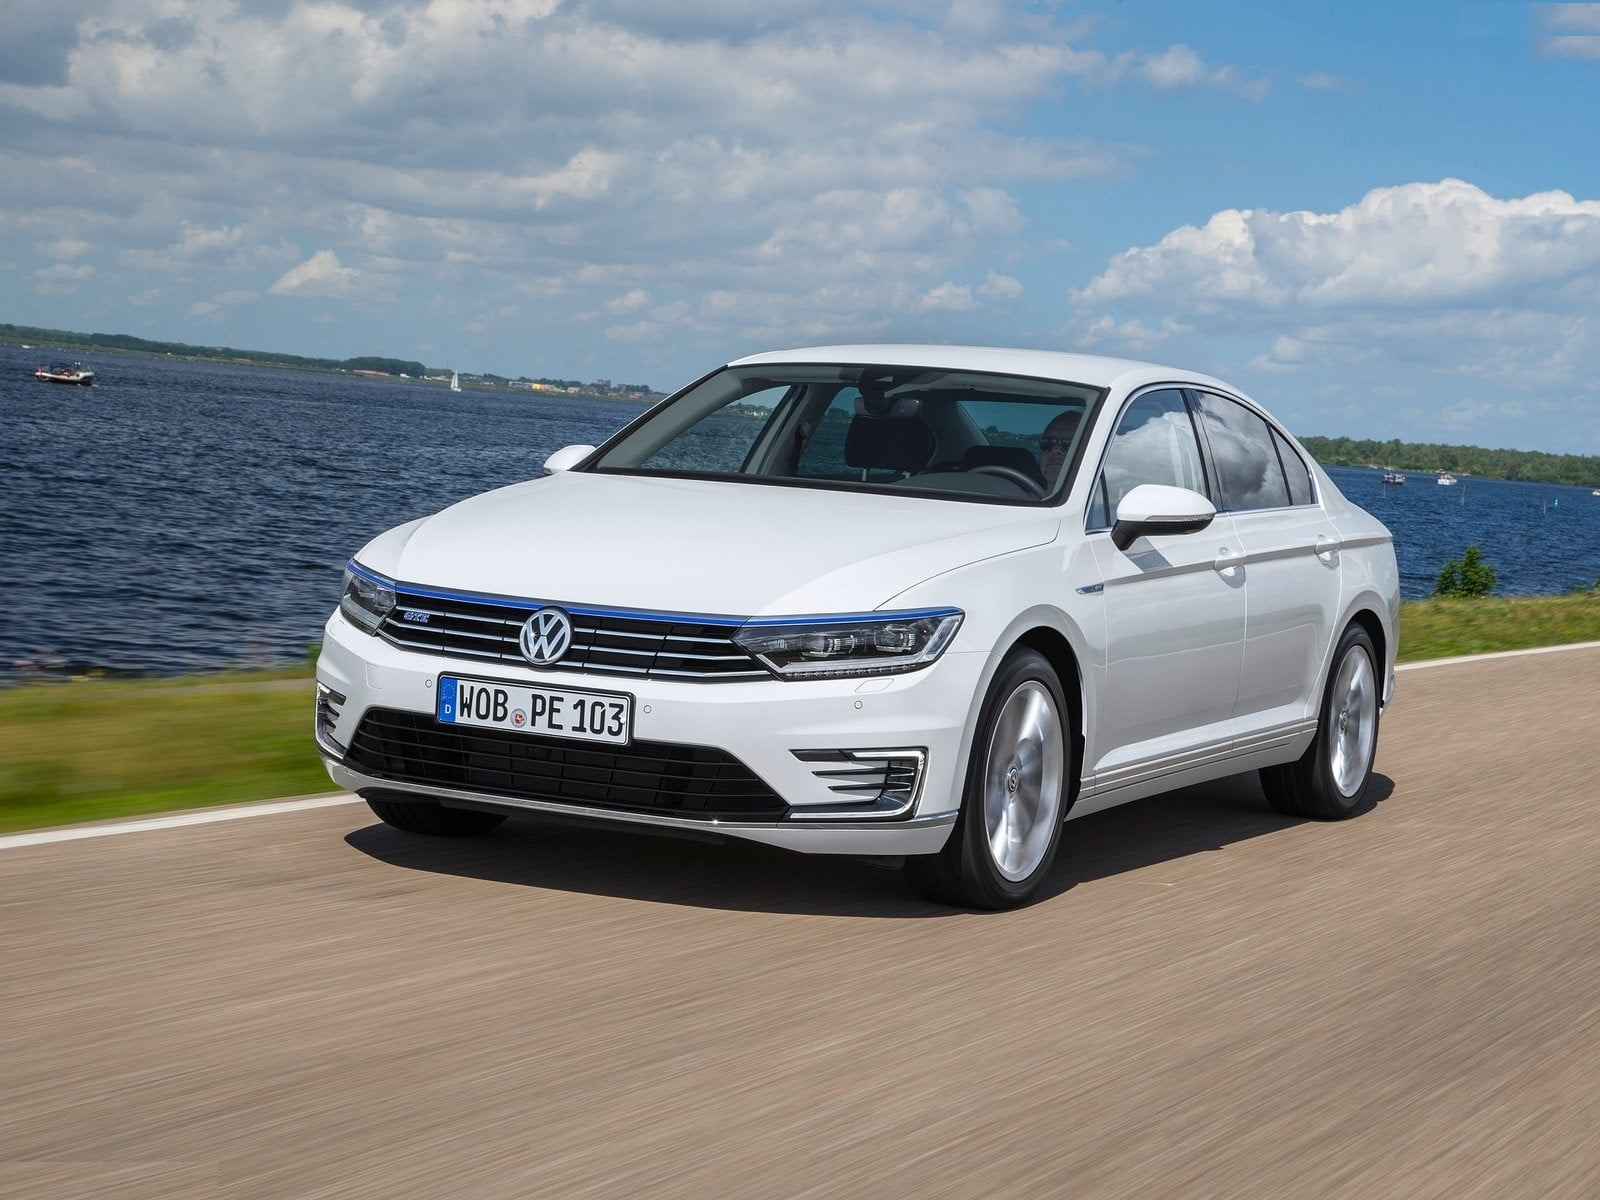 New 2017 Volkswagen Passat India Images Carblogindia